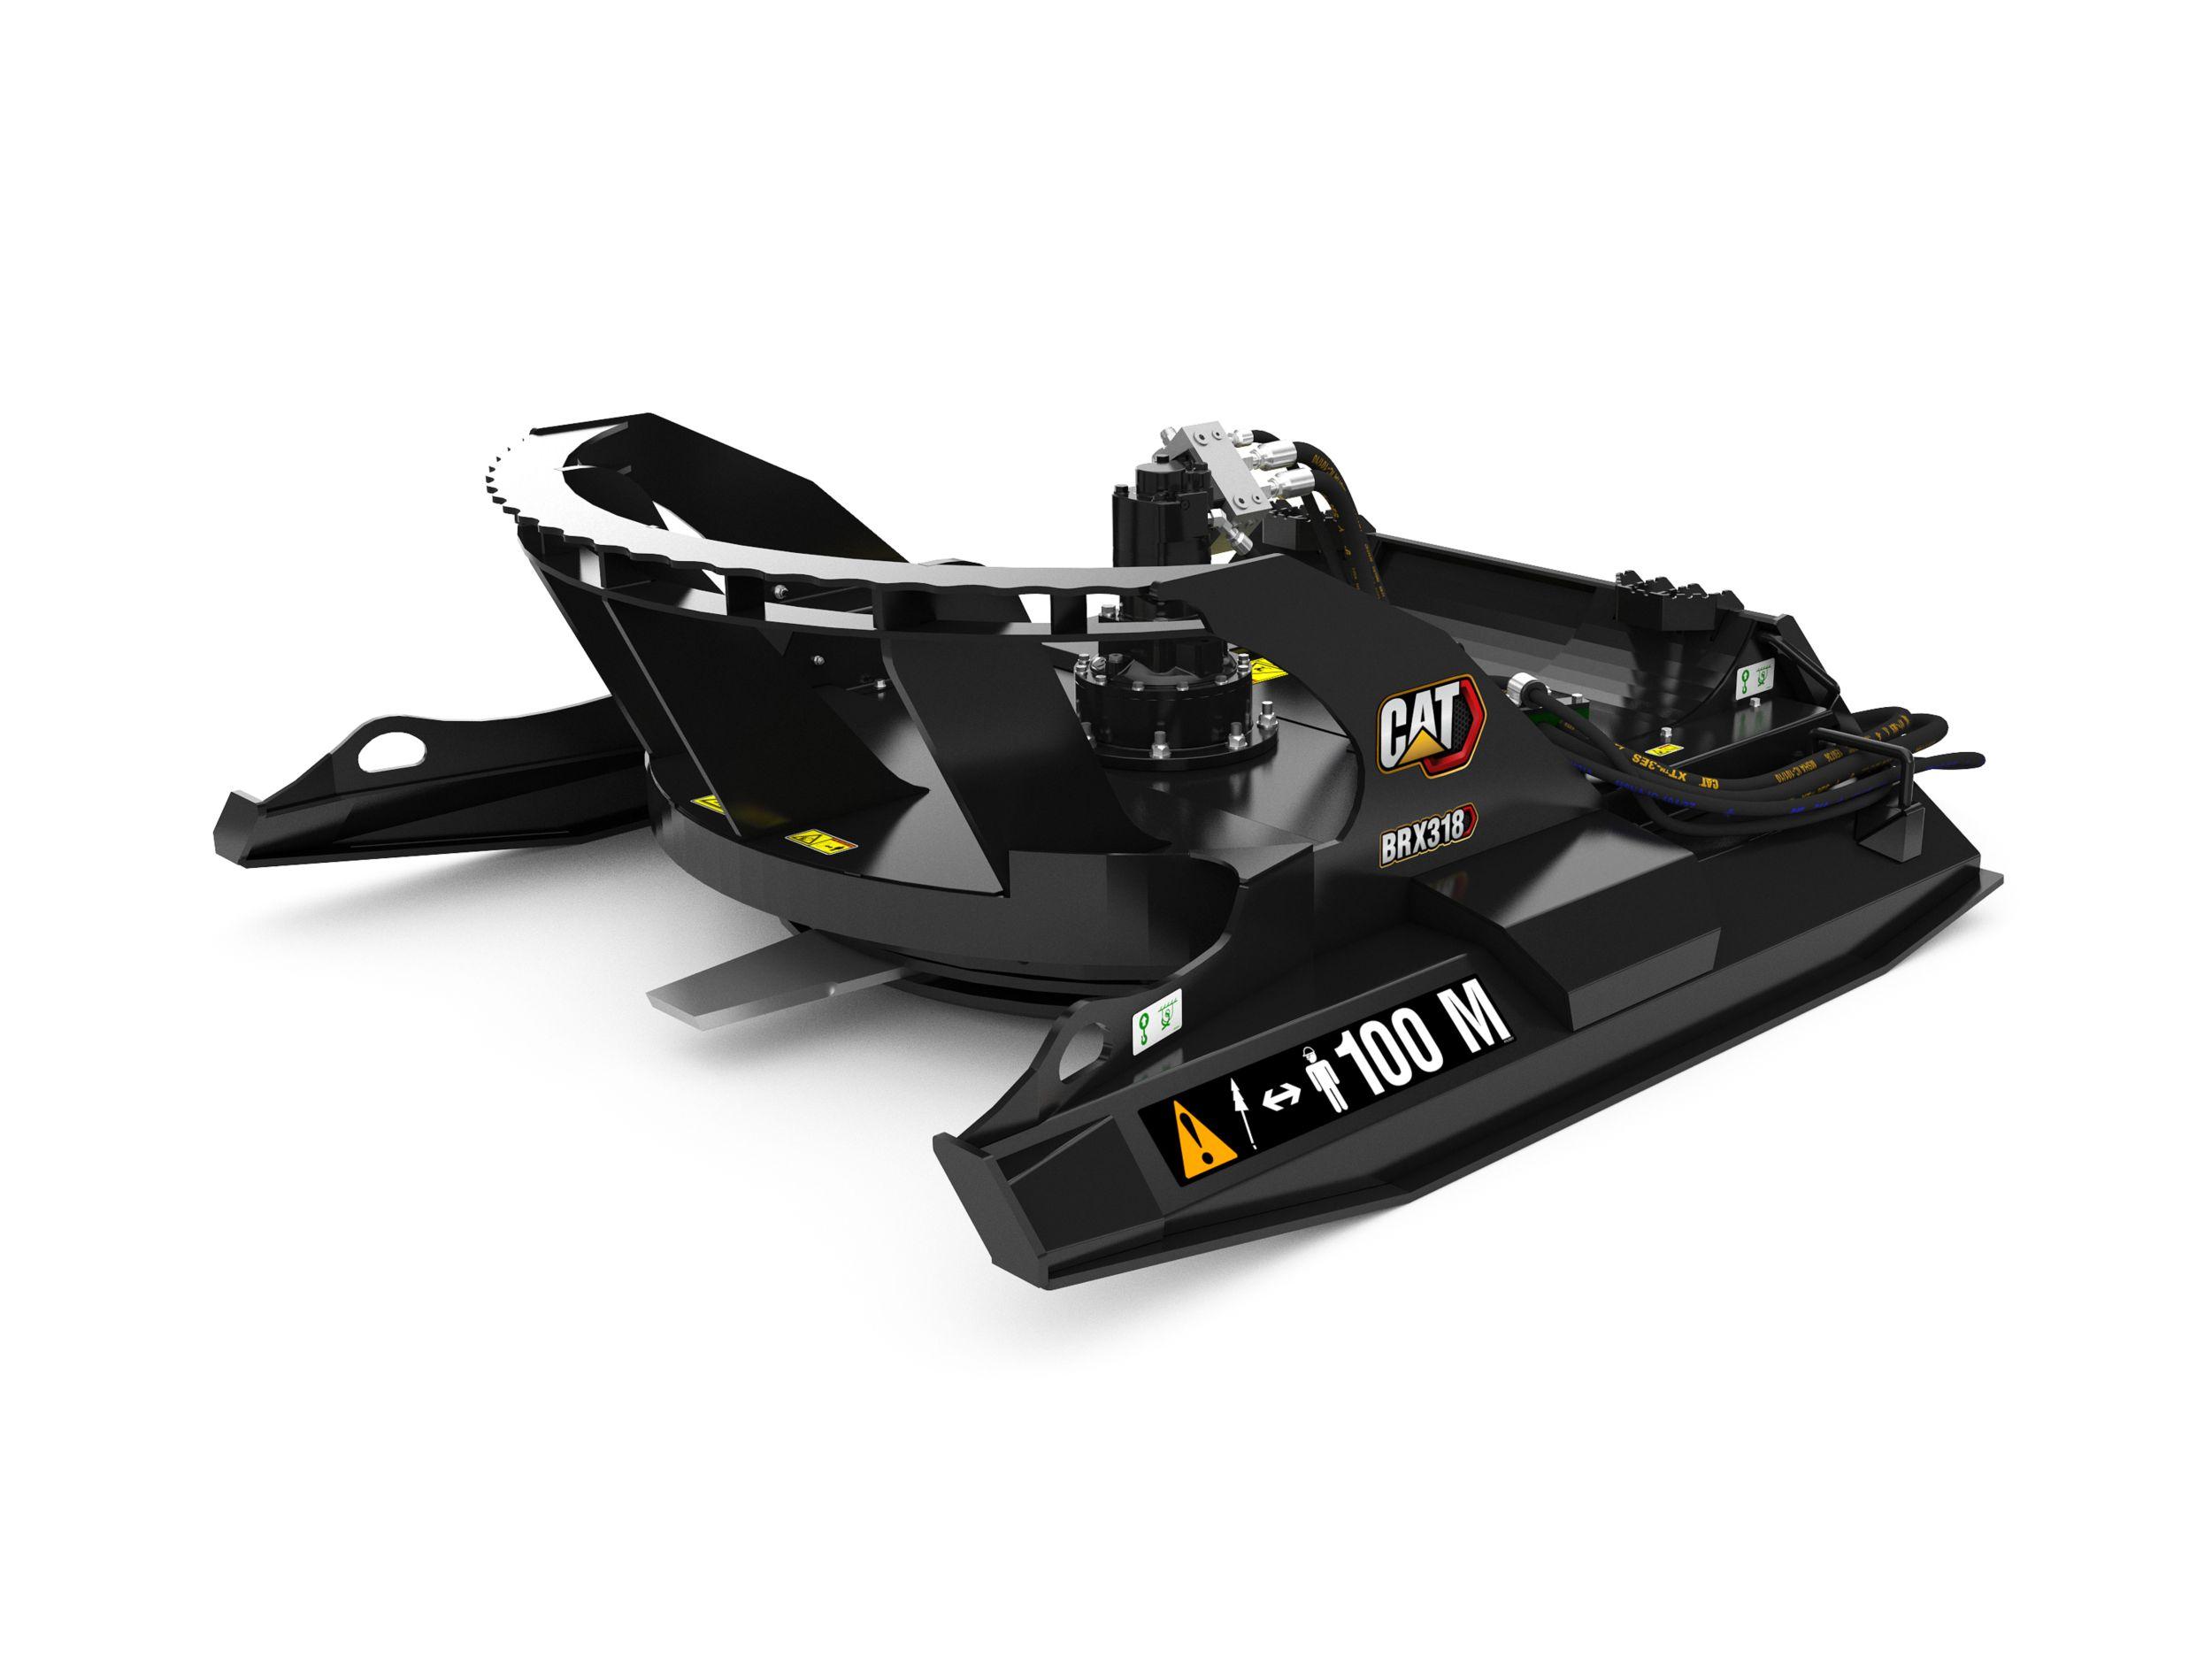 BRX318 Industrial Brushcutter